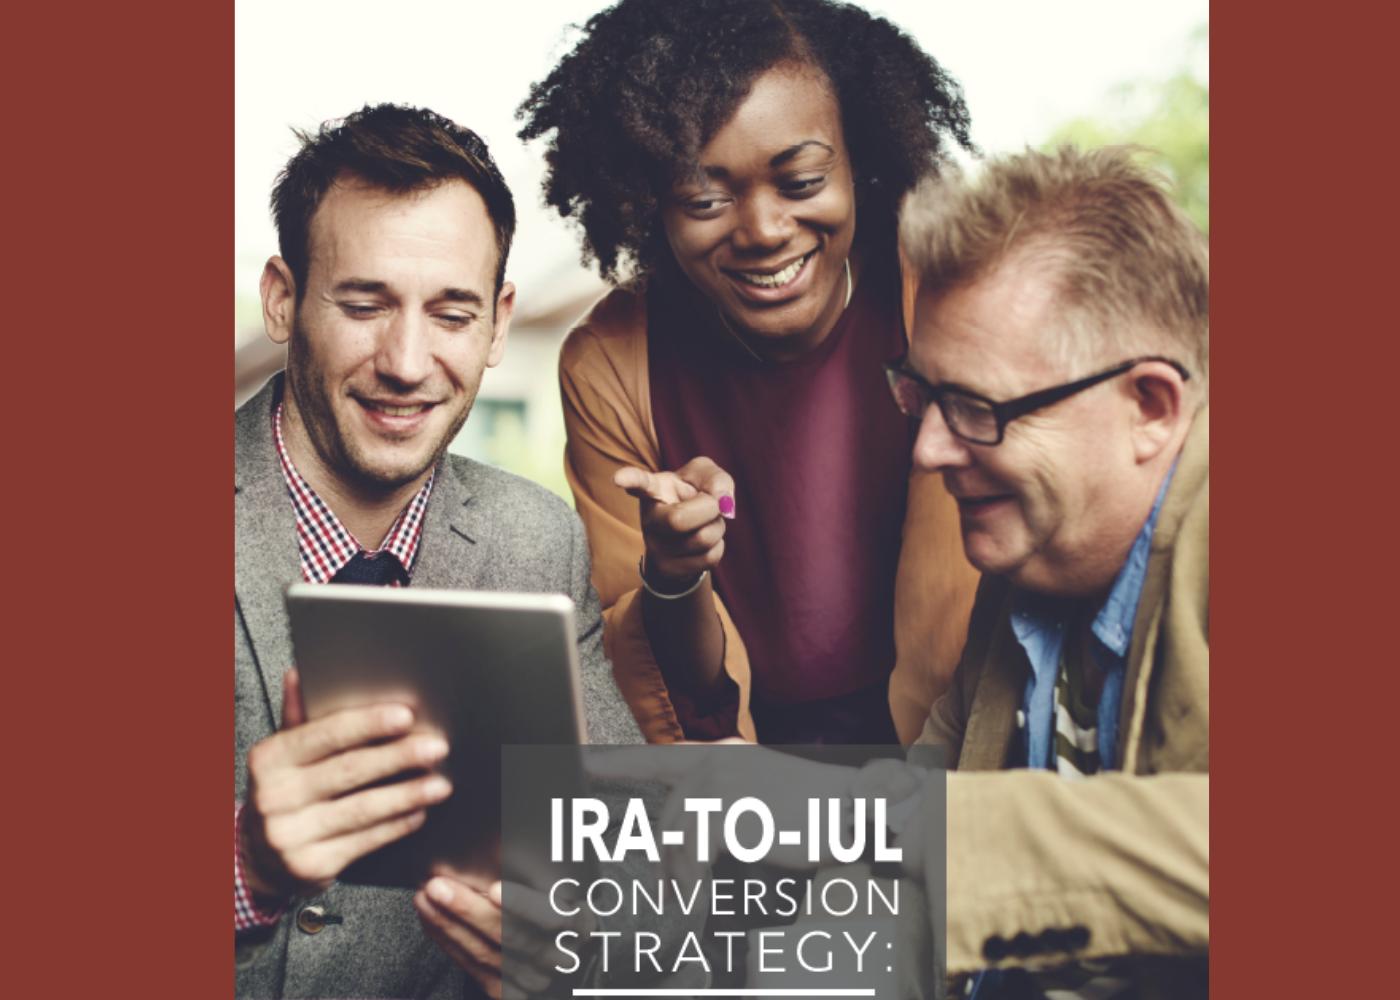 IRA-To-IUL Conversion Strategy Thumbnail